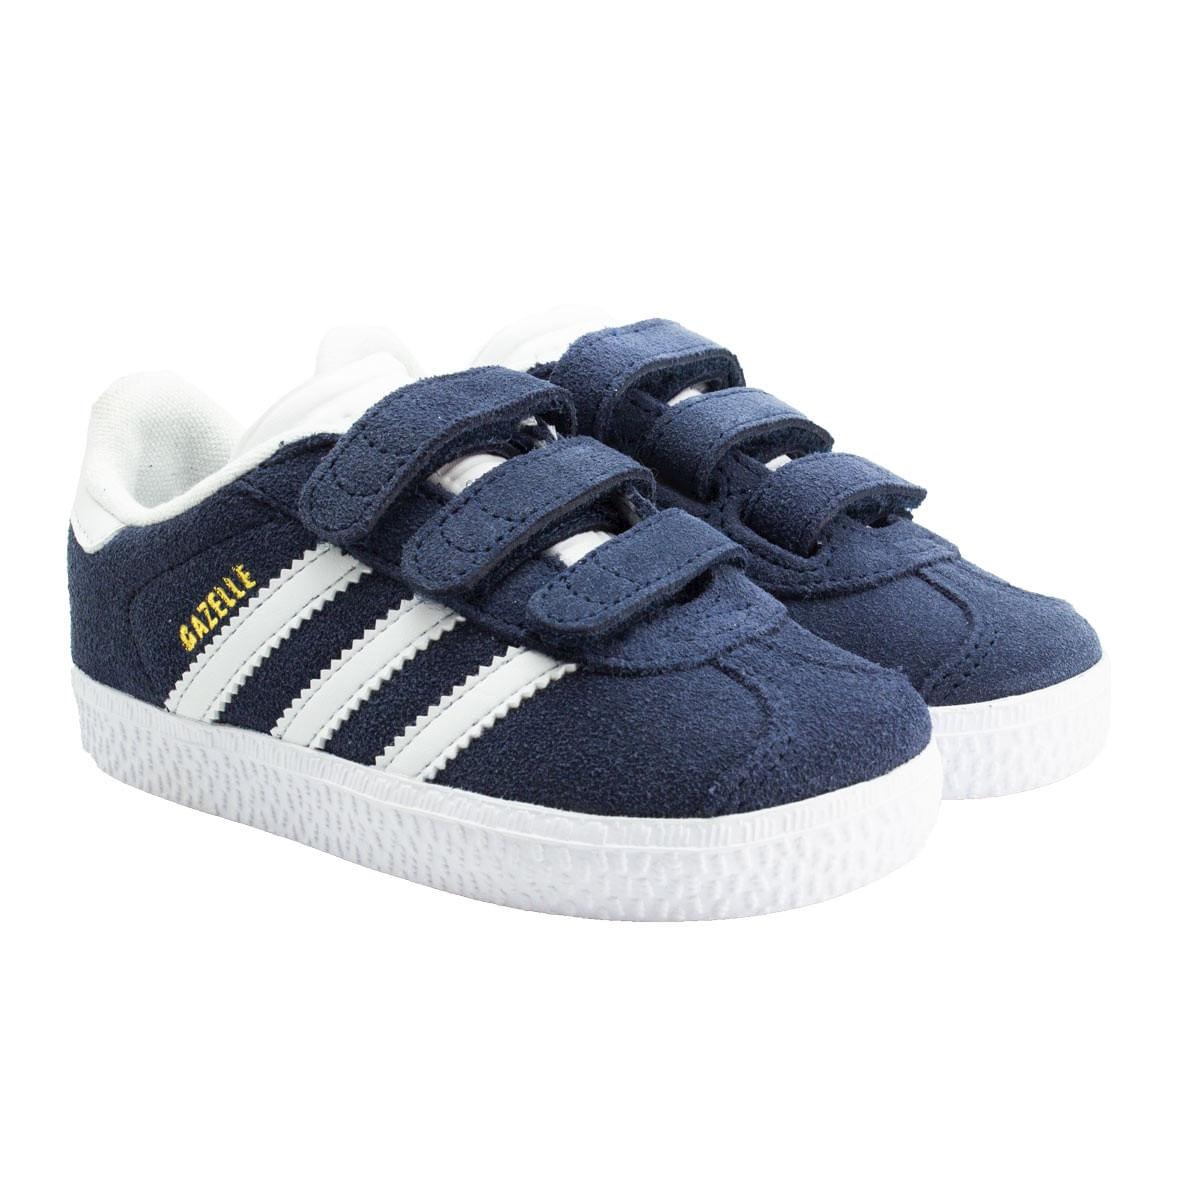 Tenis-Infantil-Adidas-Gazelle-CF-L--18-ao-25-